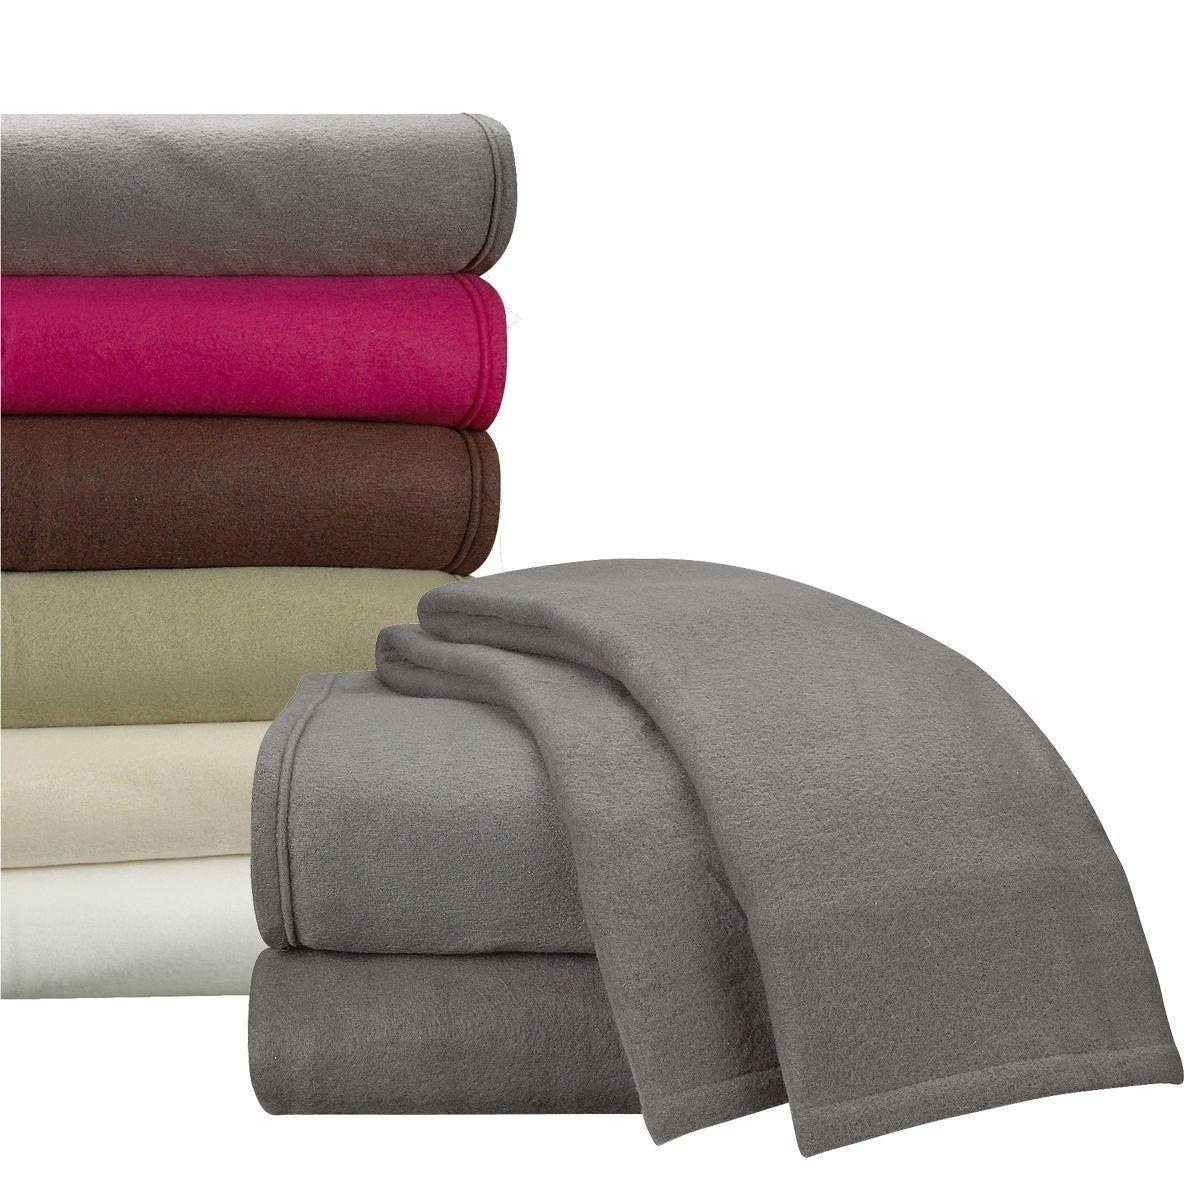 Bed Sheet Set Full Size Blue 4 Piece Plush Fleece Deep Pocket Ultra Soft Solid